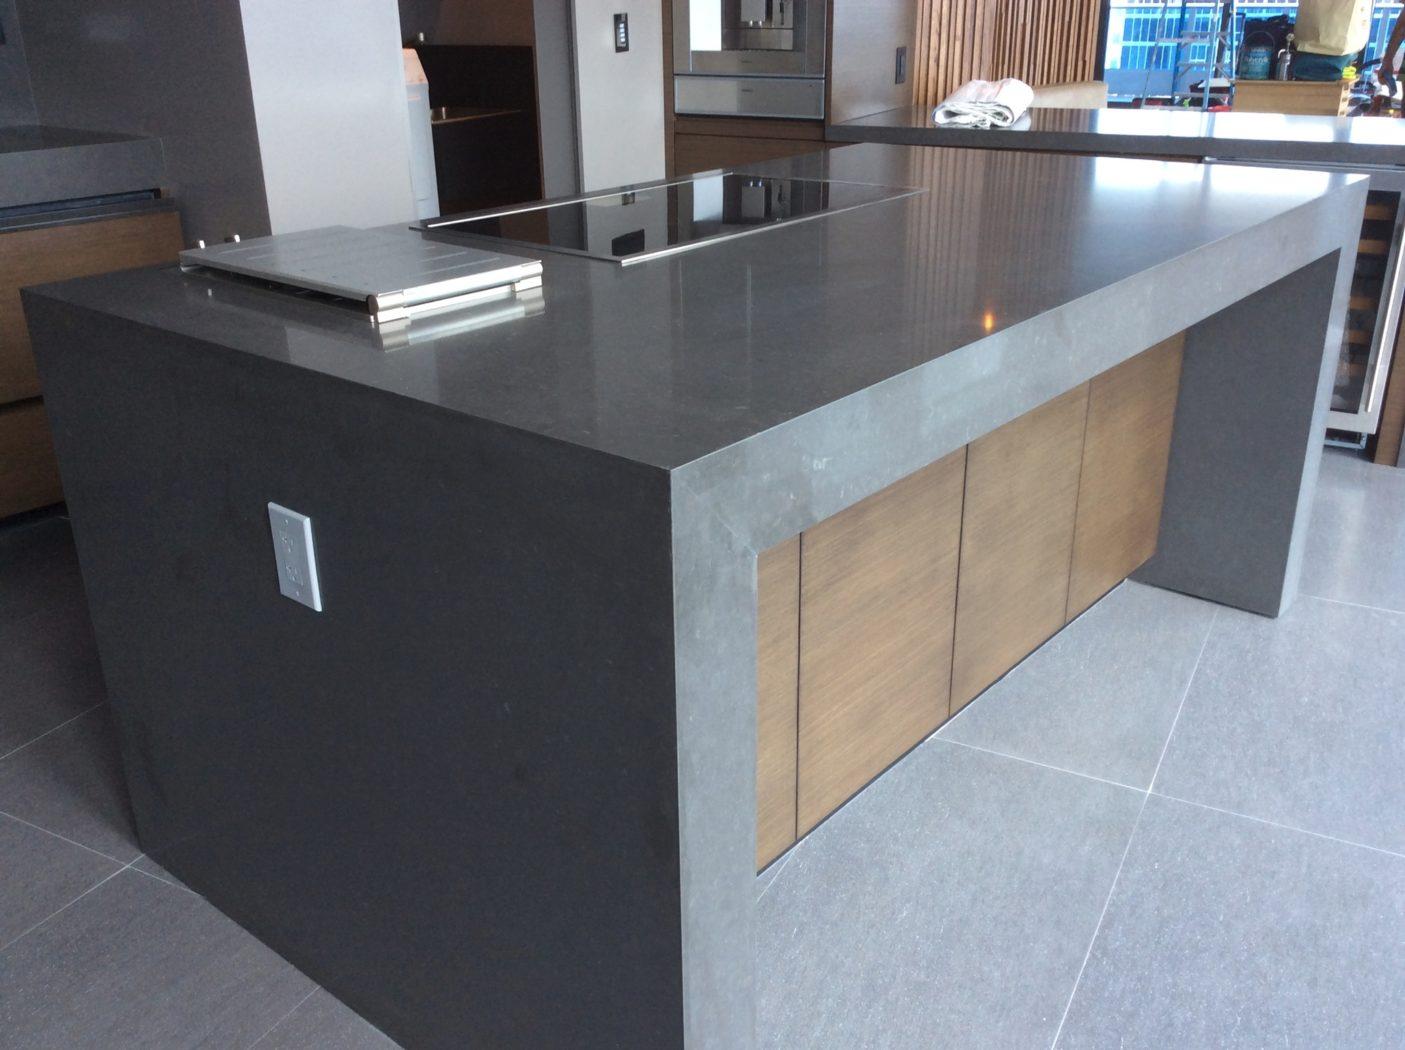 Kitchens-168.jpg